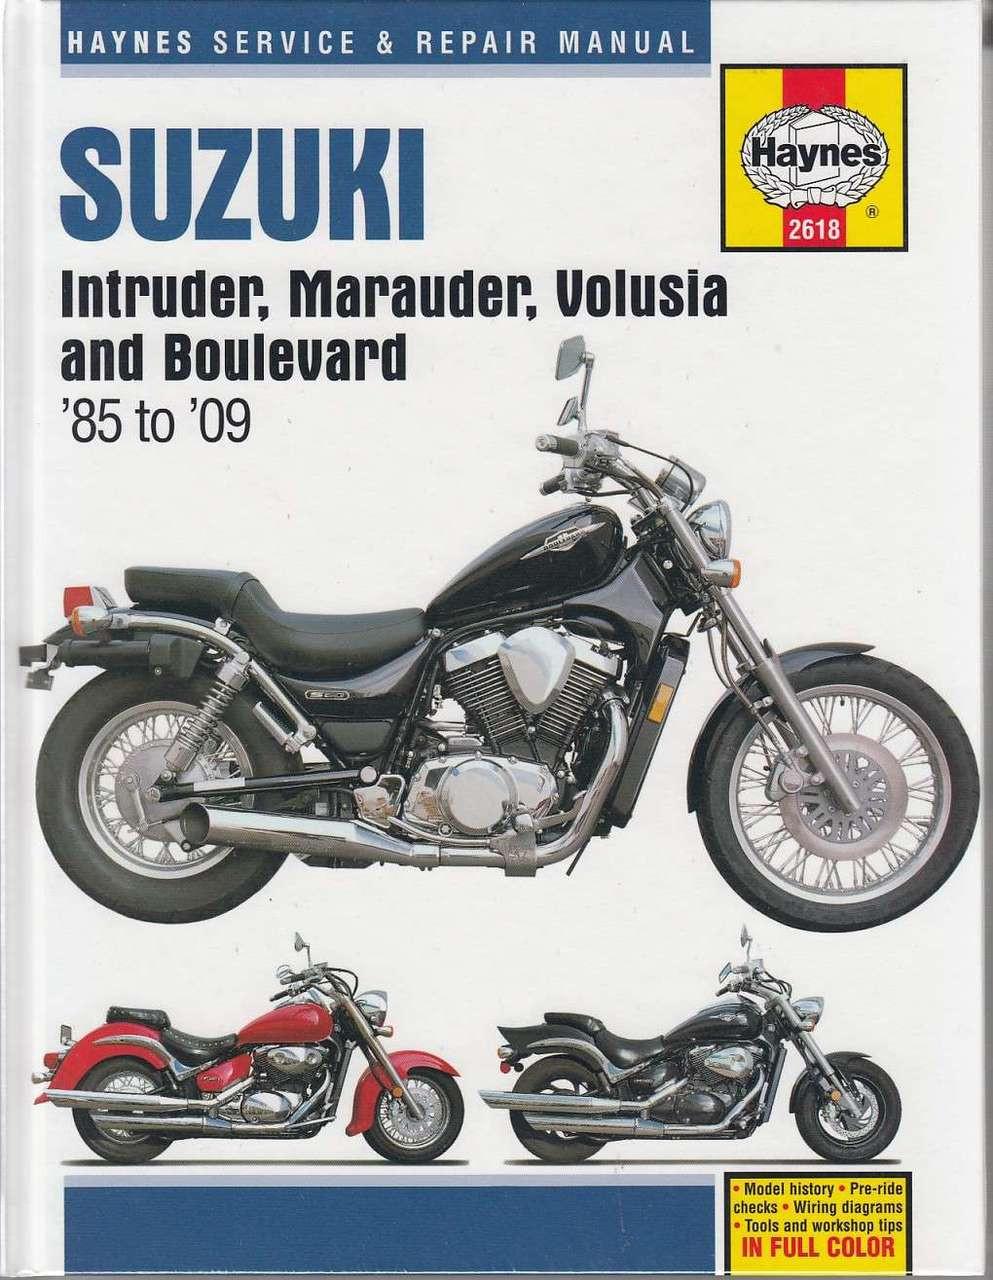 Suzuki intruder, Marauder, Volusia and Boulevard Workshop Manual ...